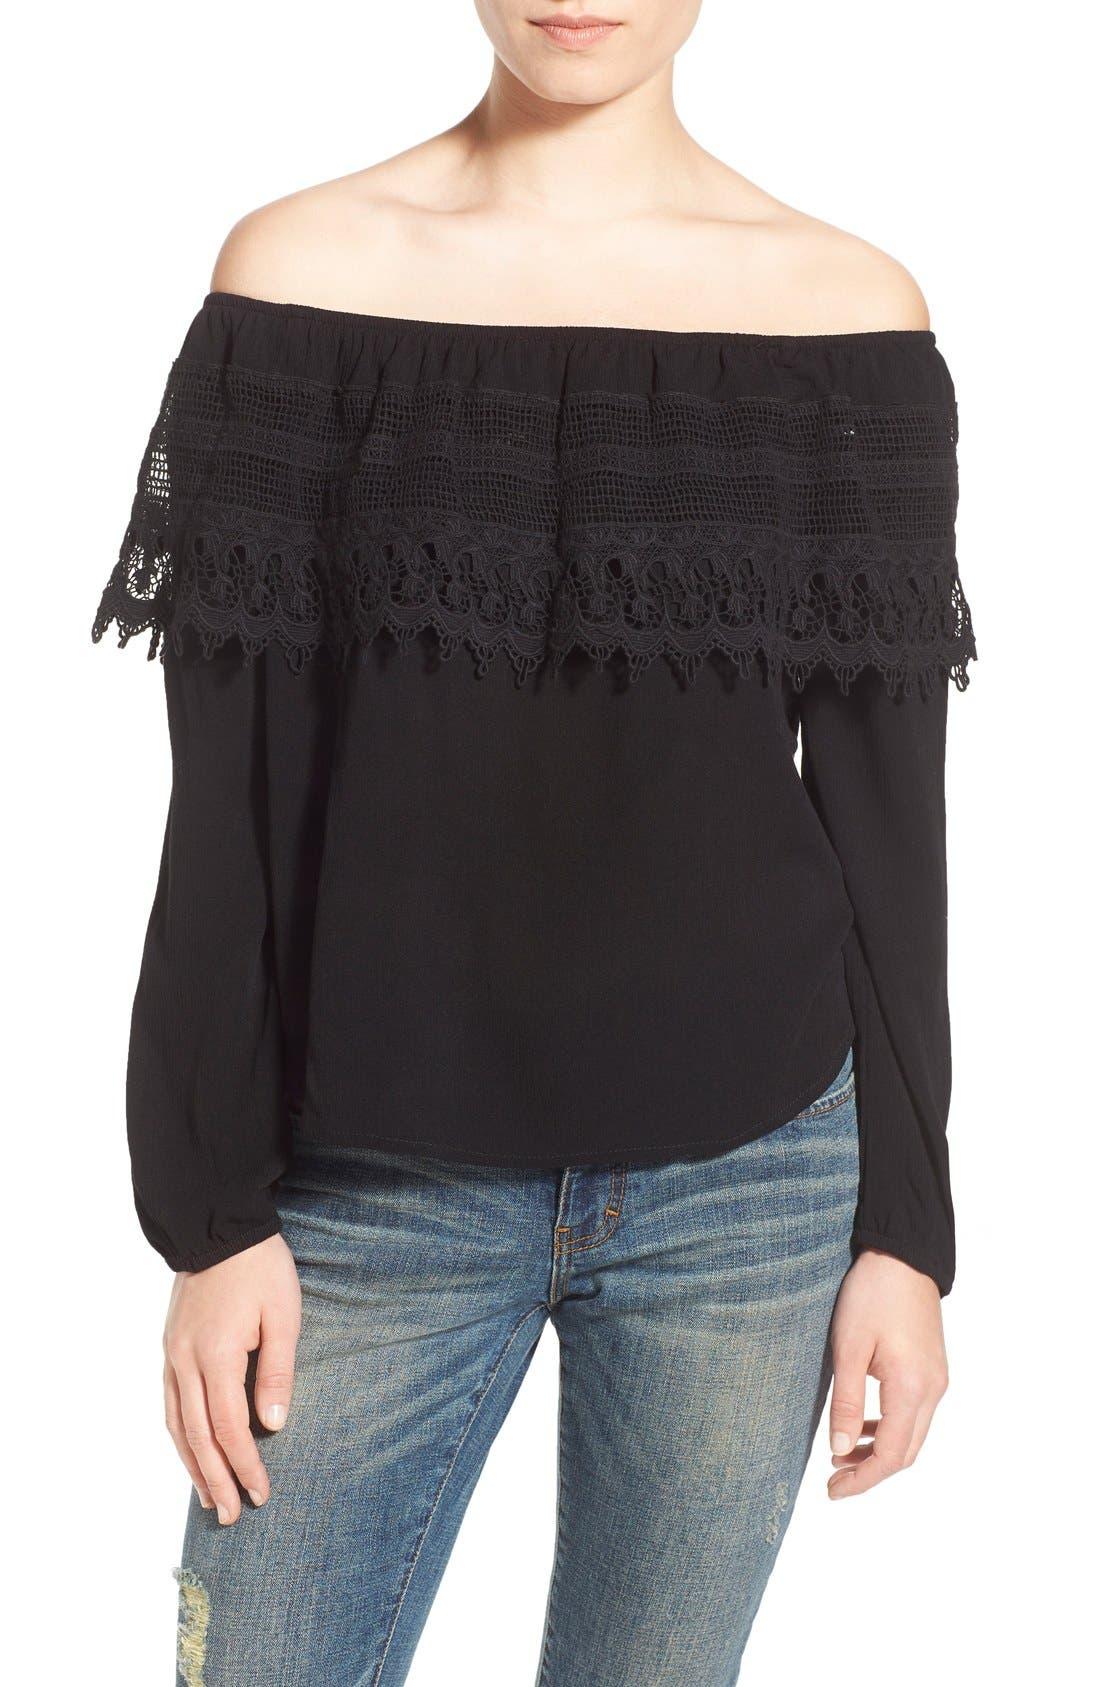 SOCIALITE Crochet Off the Shoulder Top, Main, color, 005